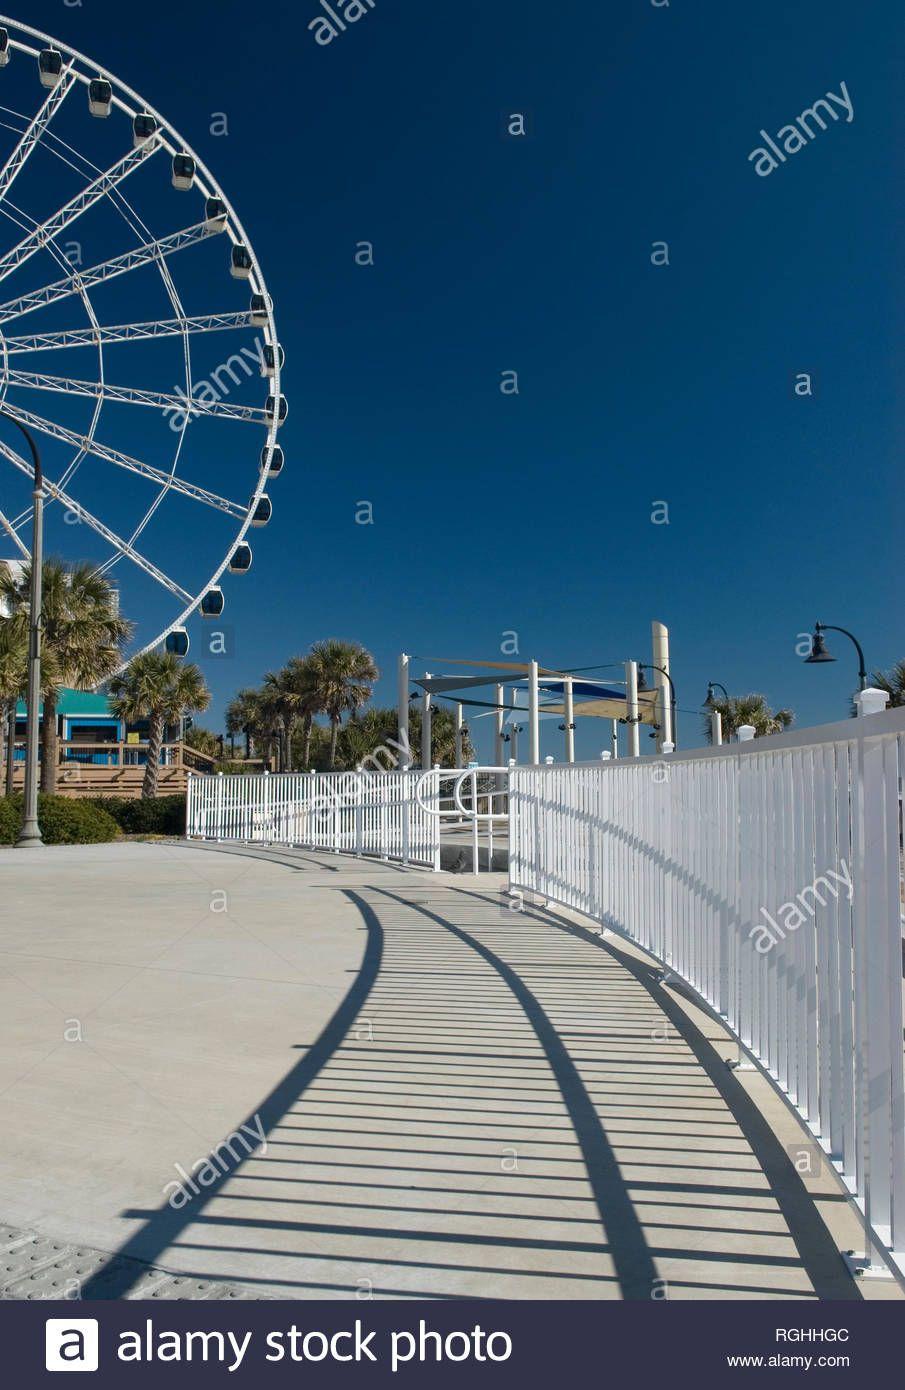 Download This Stock Image Plyler Park Myrtle Beach South Carolina Usa Rghhgc From Alamy S Li In 2020 Myrtle Beach South Carolina South Carolina Beaches Myrtle Beach